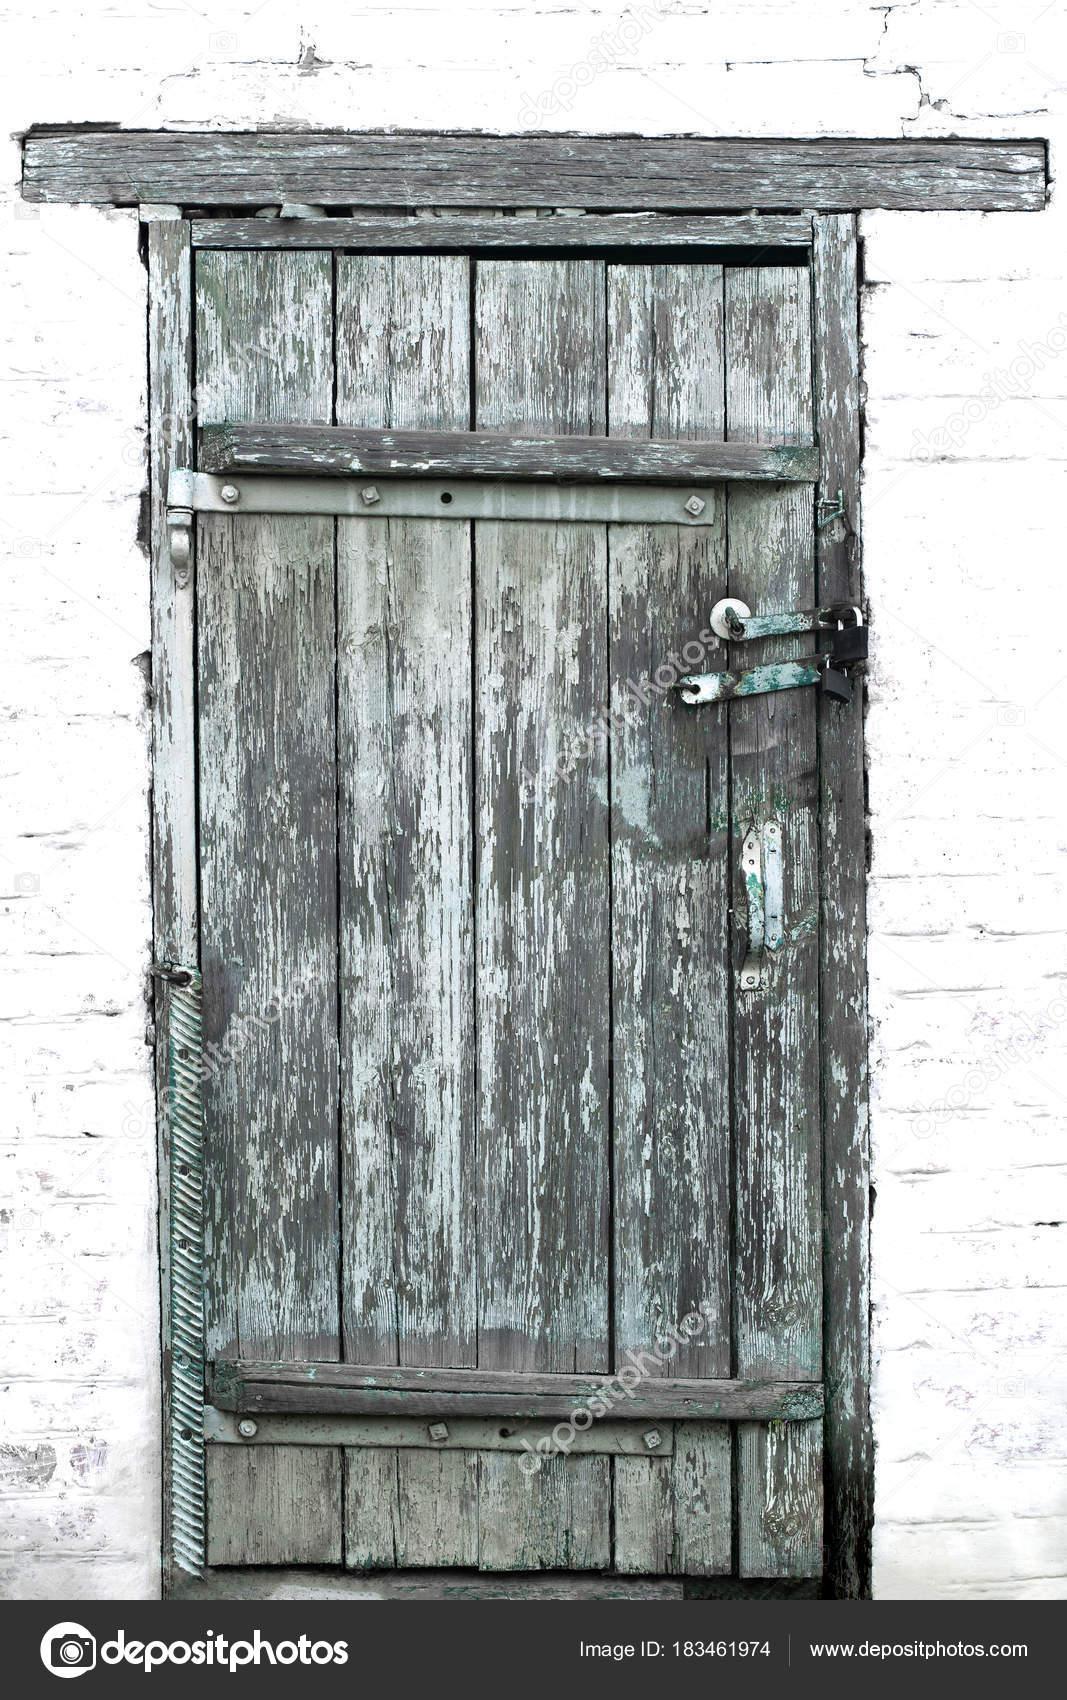 Alte Holztüren alte holztüren geschlossen zwei vorhängeschlösser vor dem